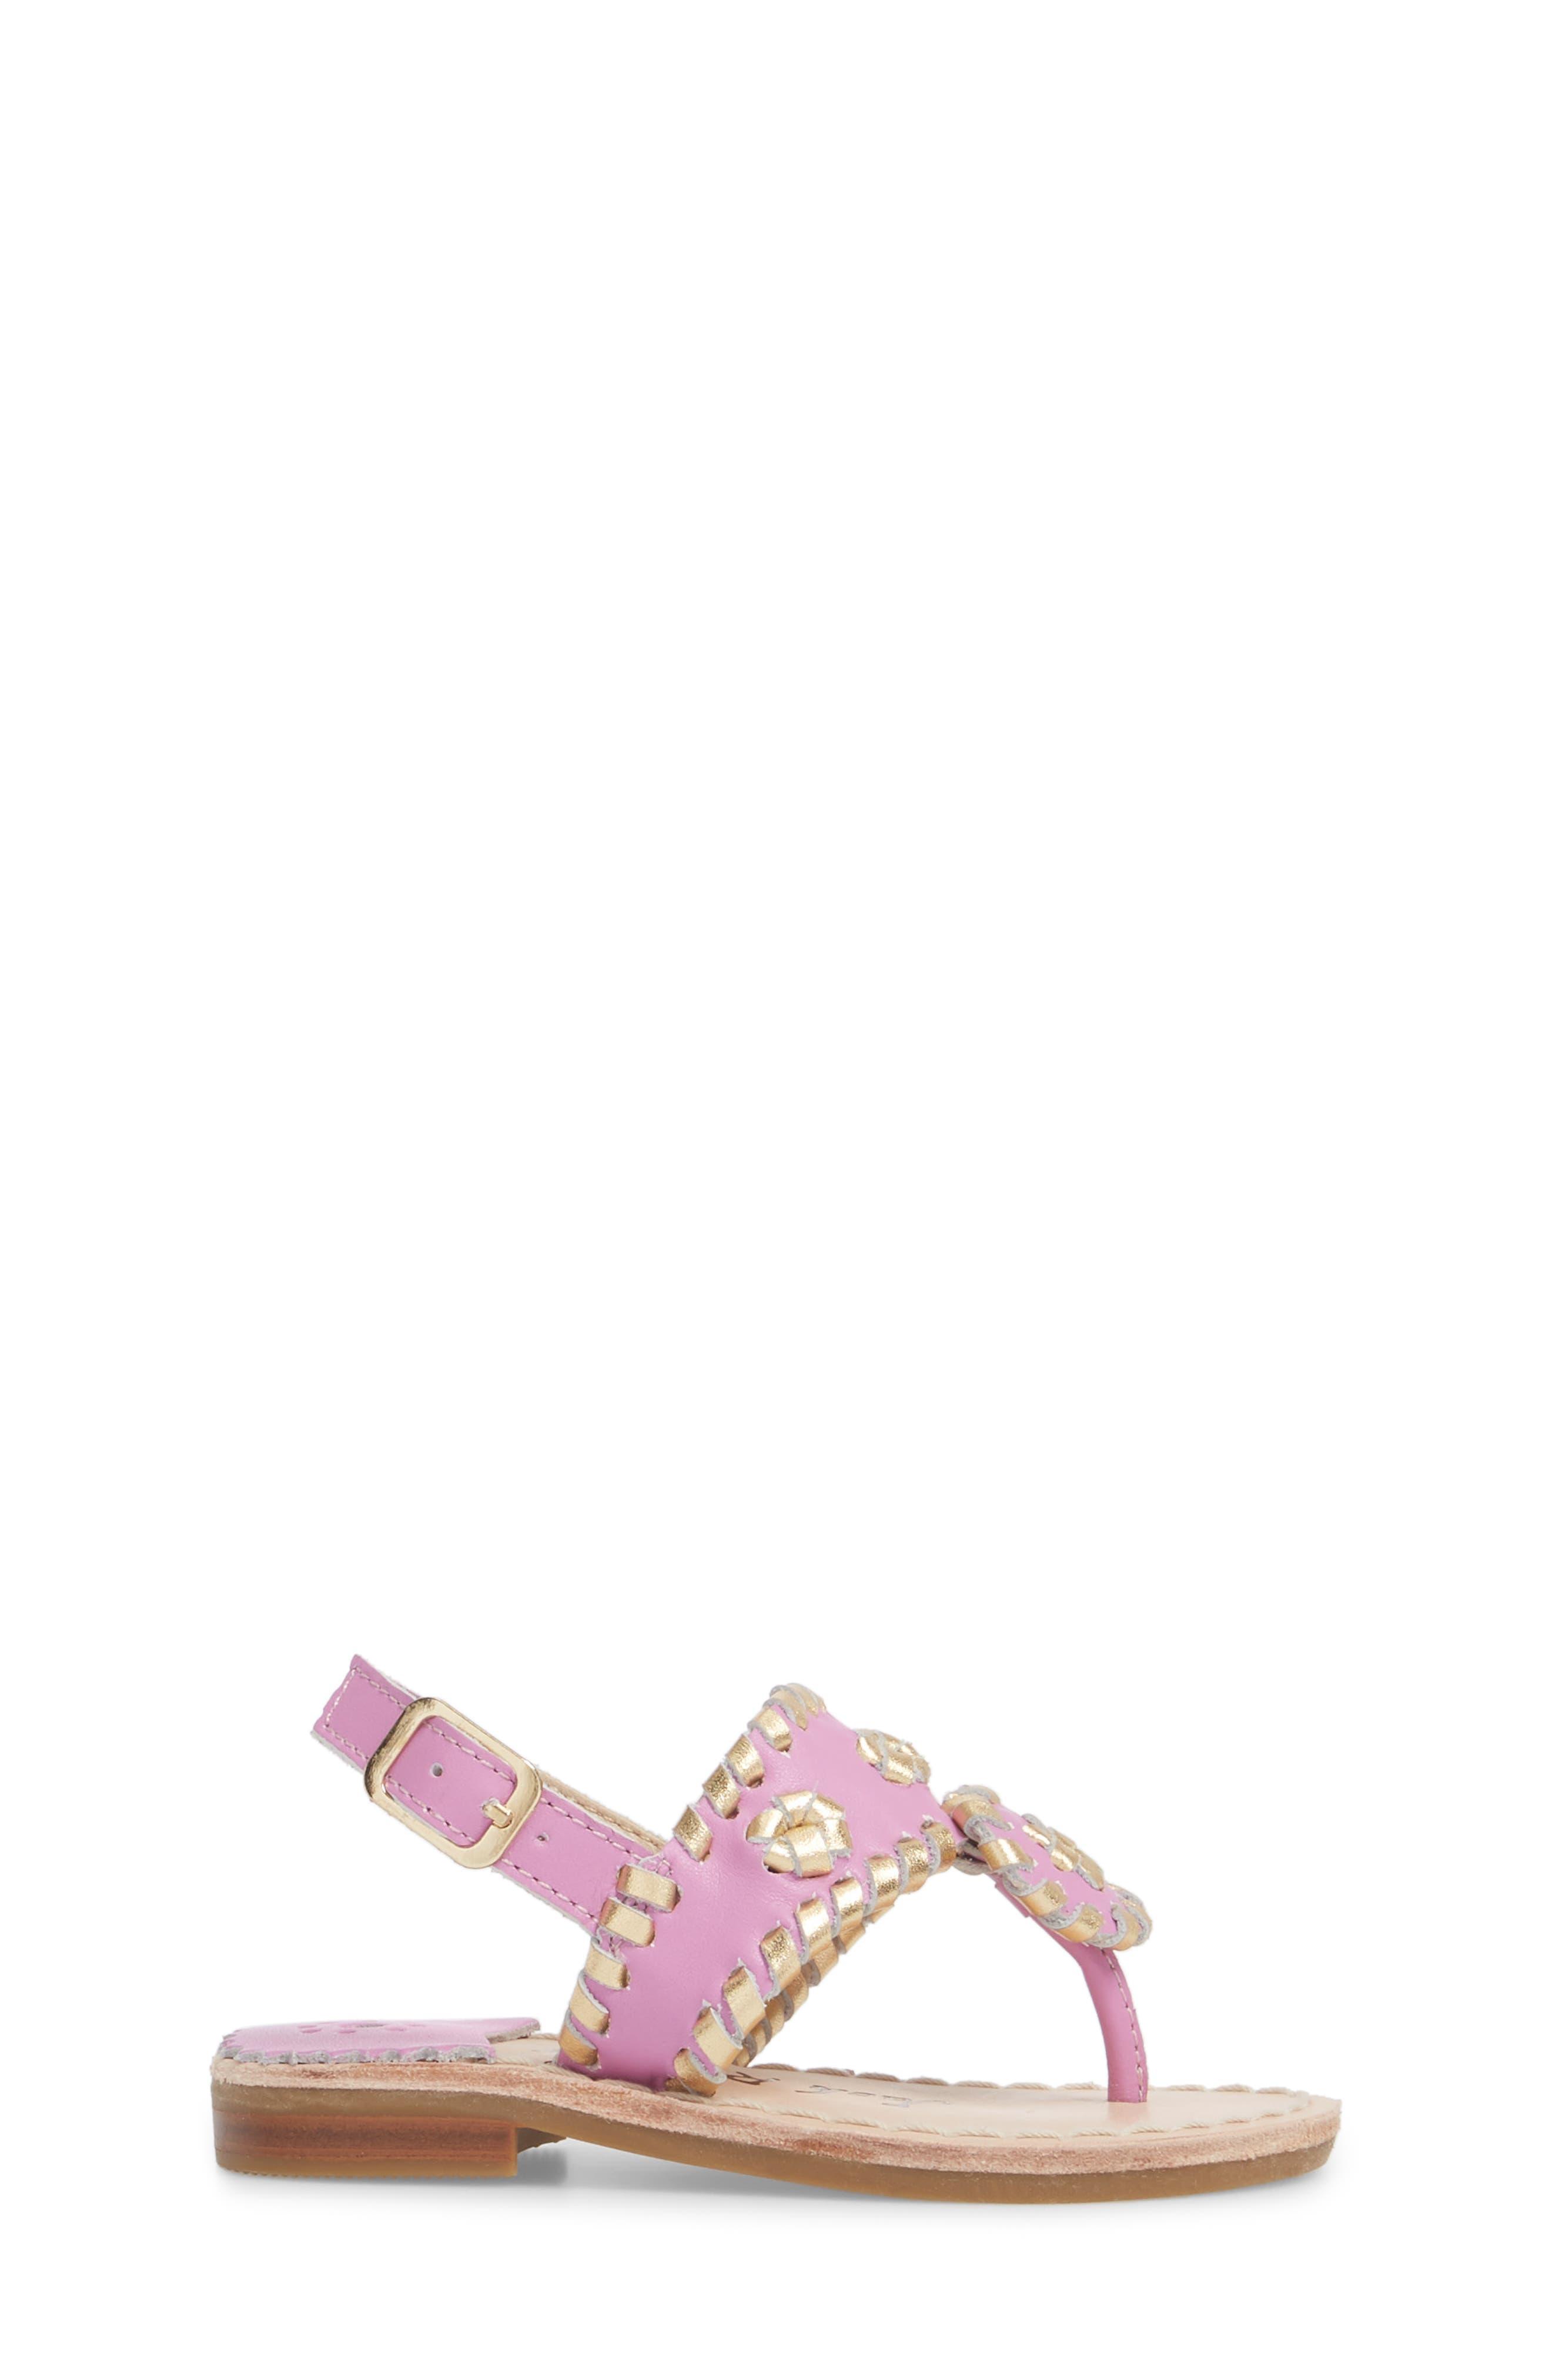 Little Miss Hollis Metallic Trim Sandal,                             Alternate thumbnail 3, color,                             Lavender Pink/ Gold Leather